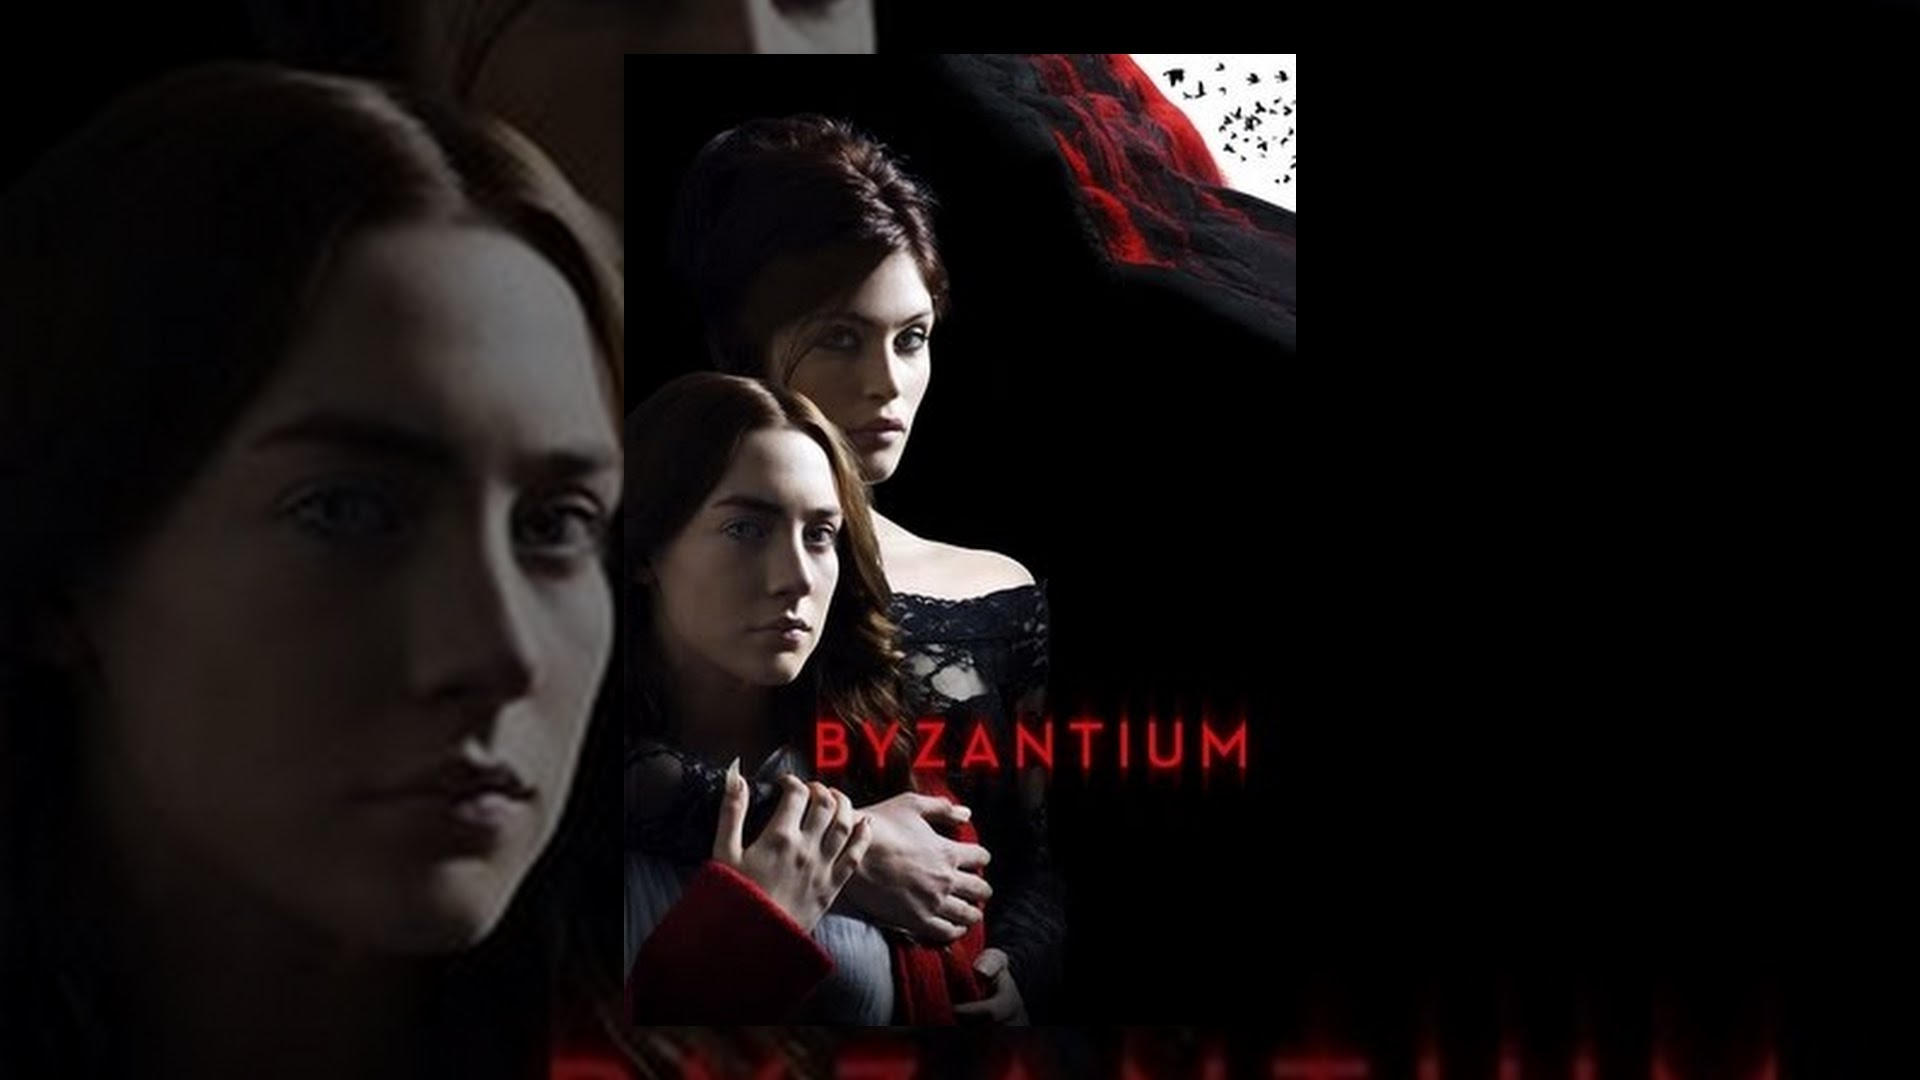 Beautiful darkness movie release date in Melbourne